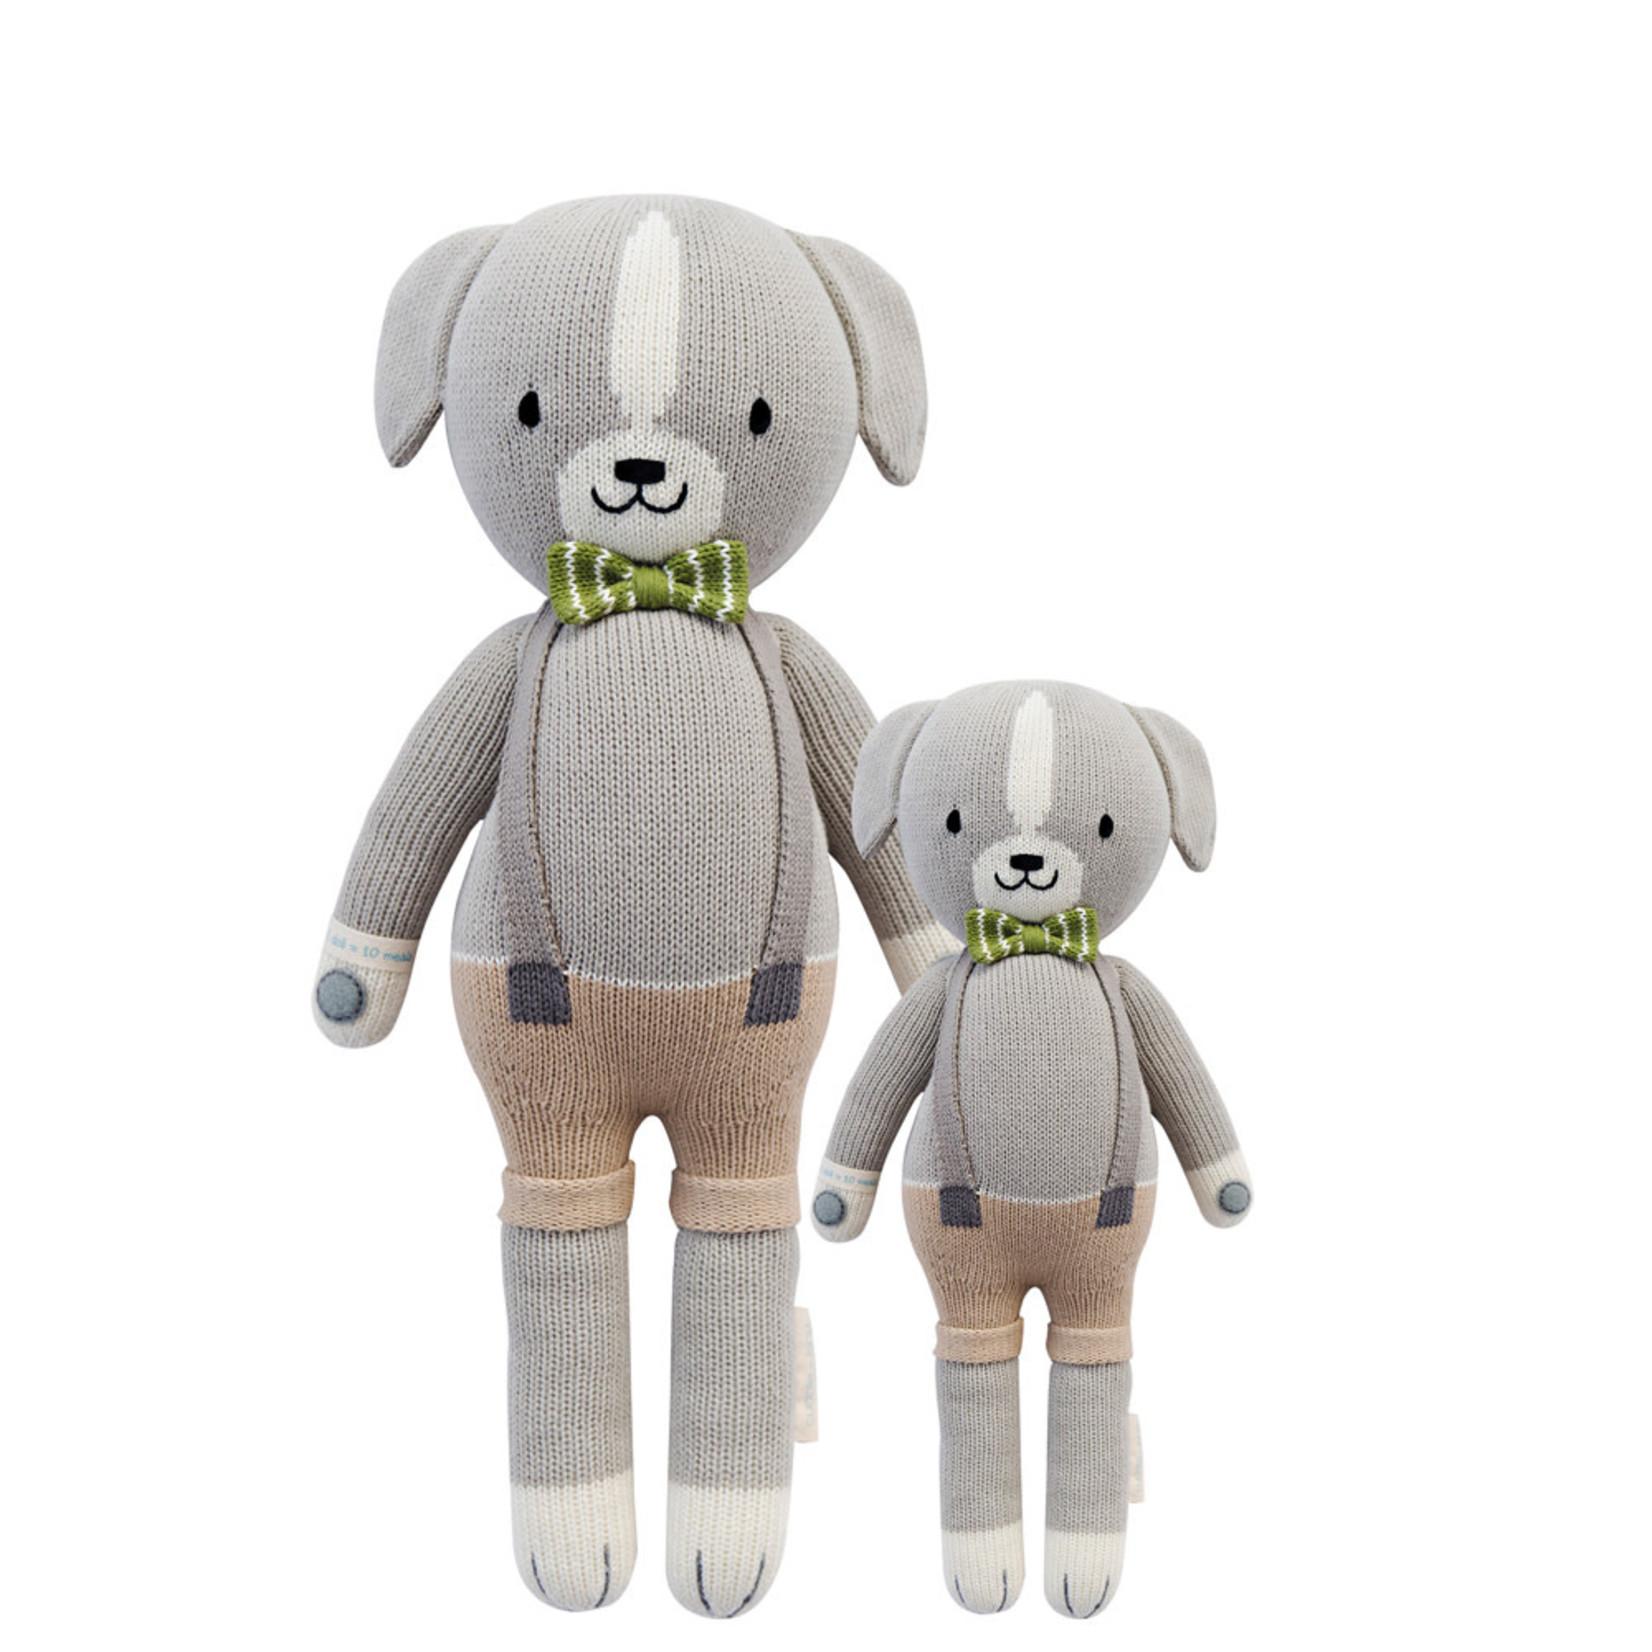 Cuddle + Kind Cuddle + Kind Noah the Dog